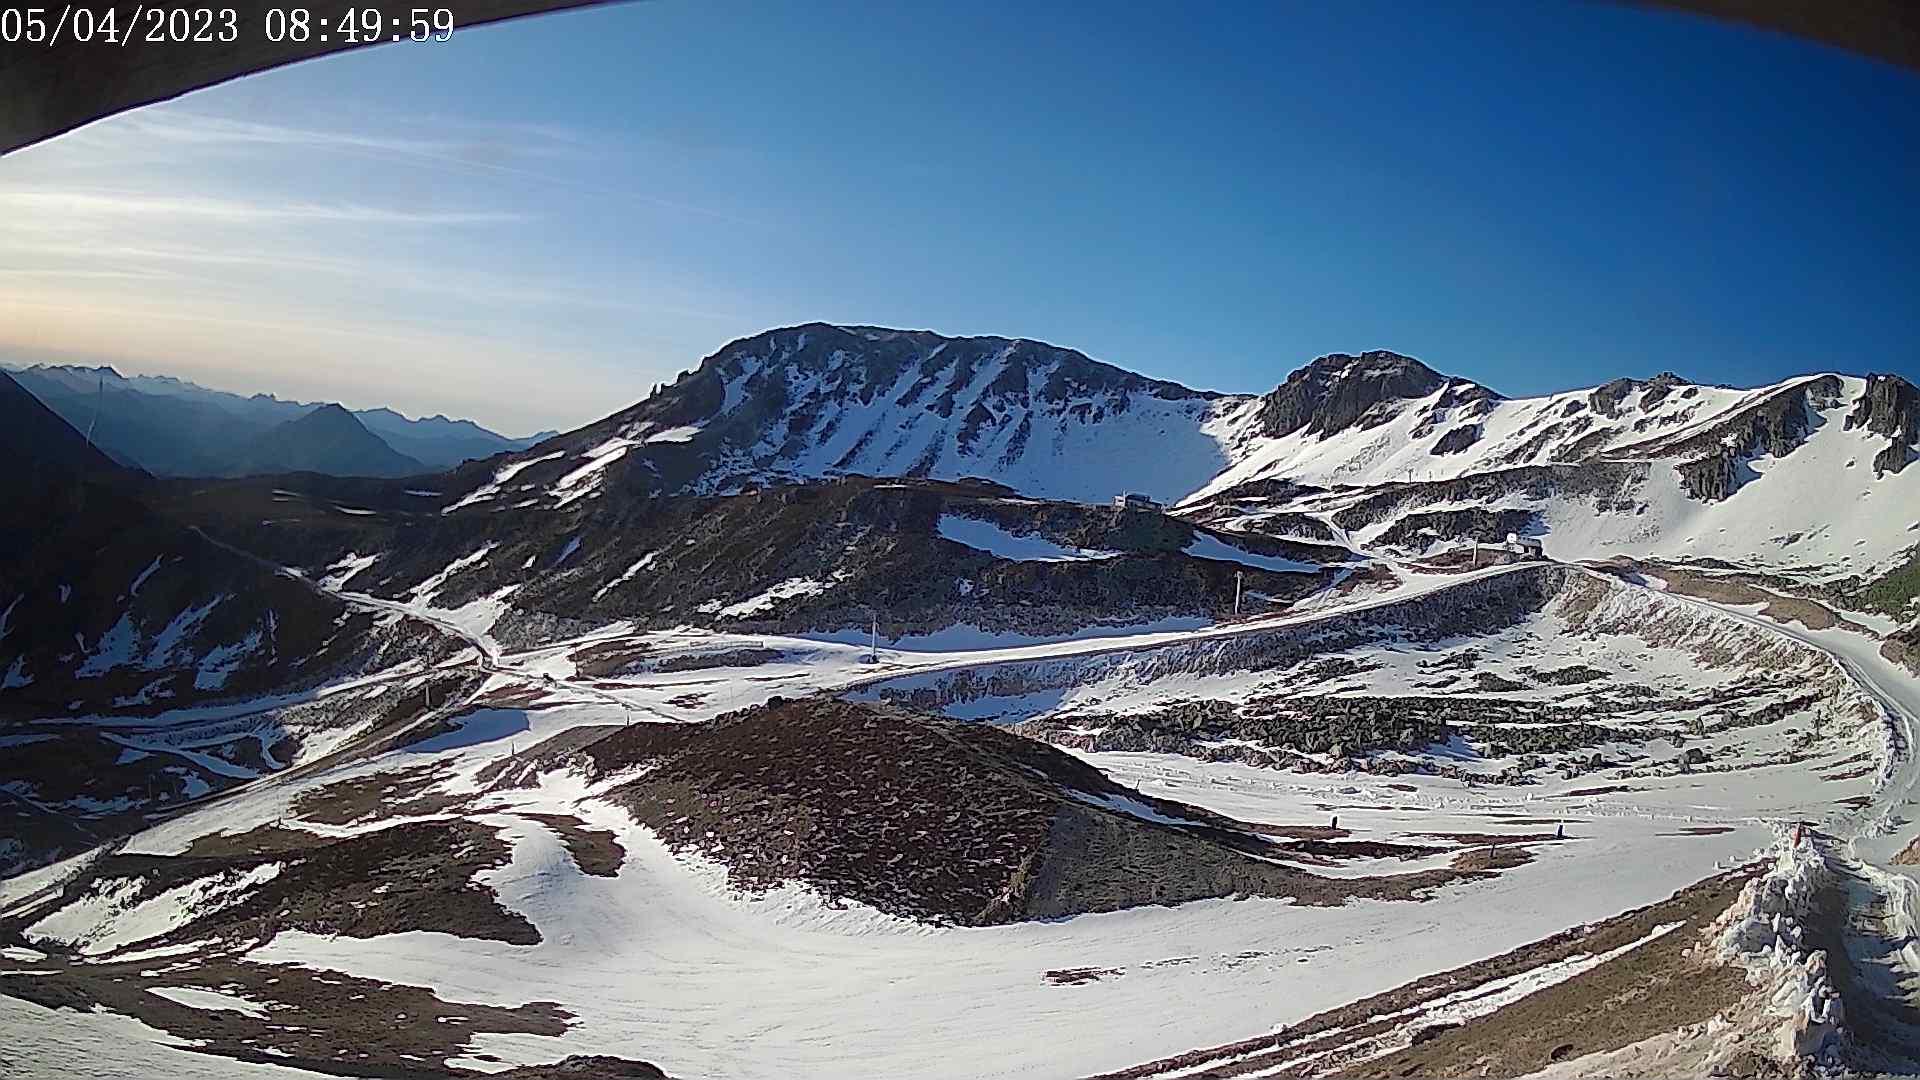 Webcam en Cebolledo 2.000m.